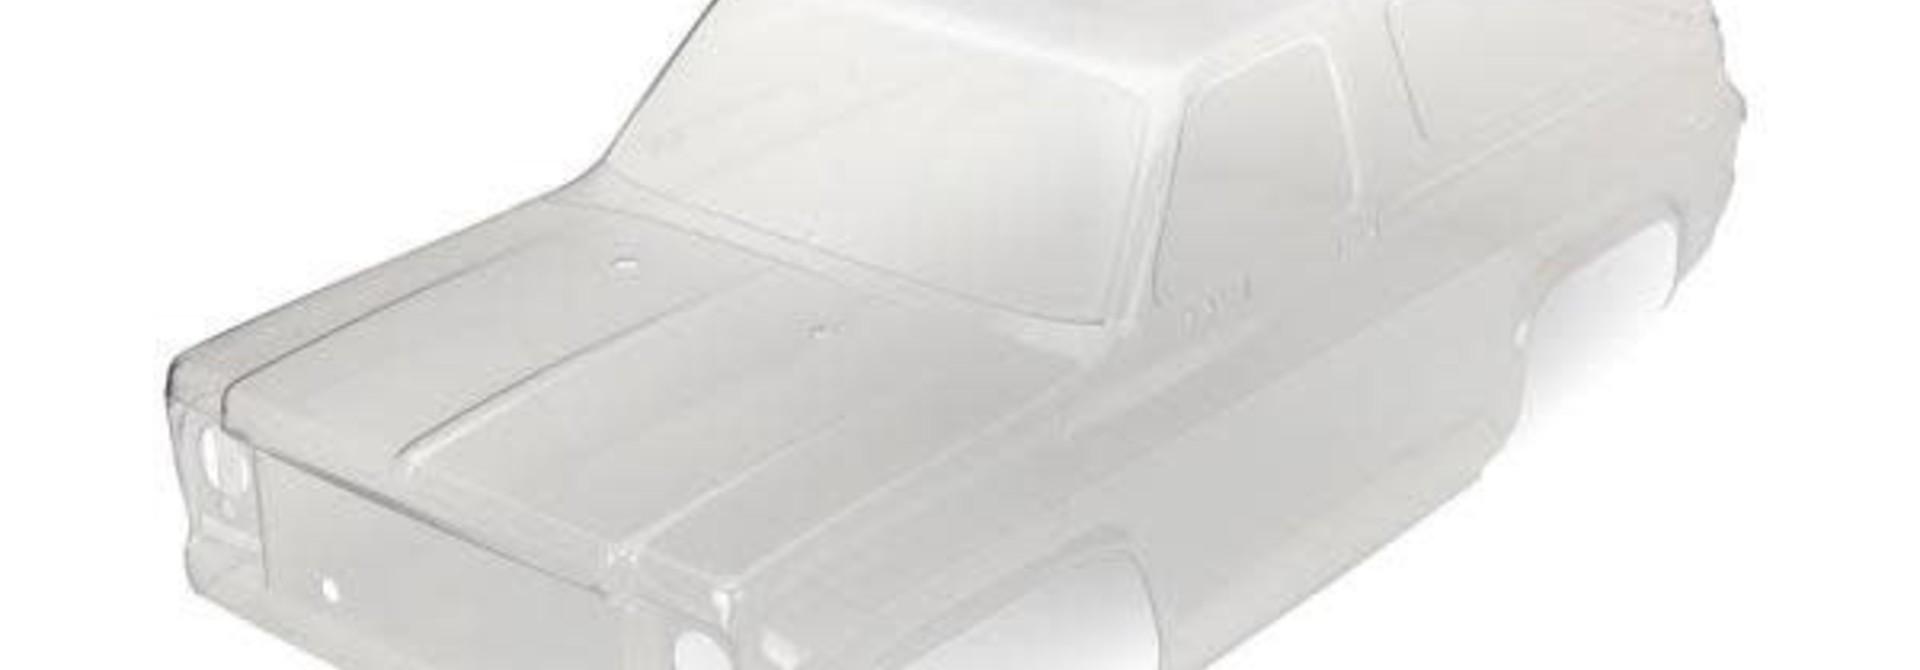 Body, Chevrolet Blazer (1979) (clear, requires painting)/ decals/ window masks, TRX8130